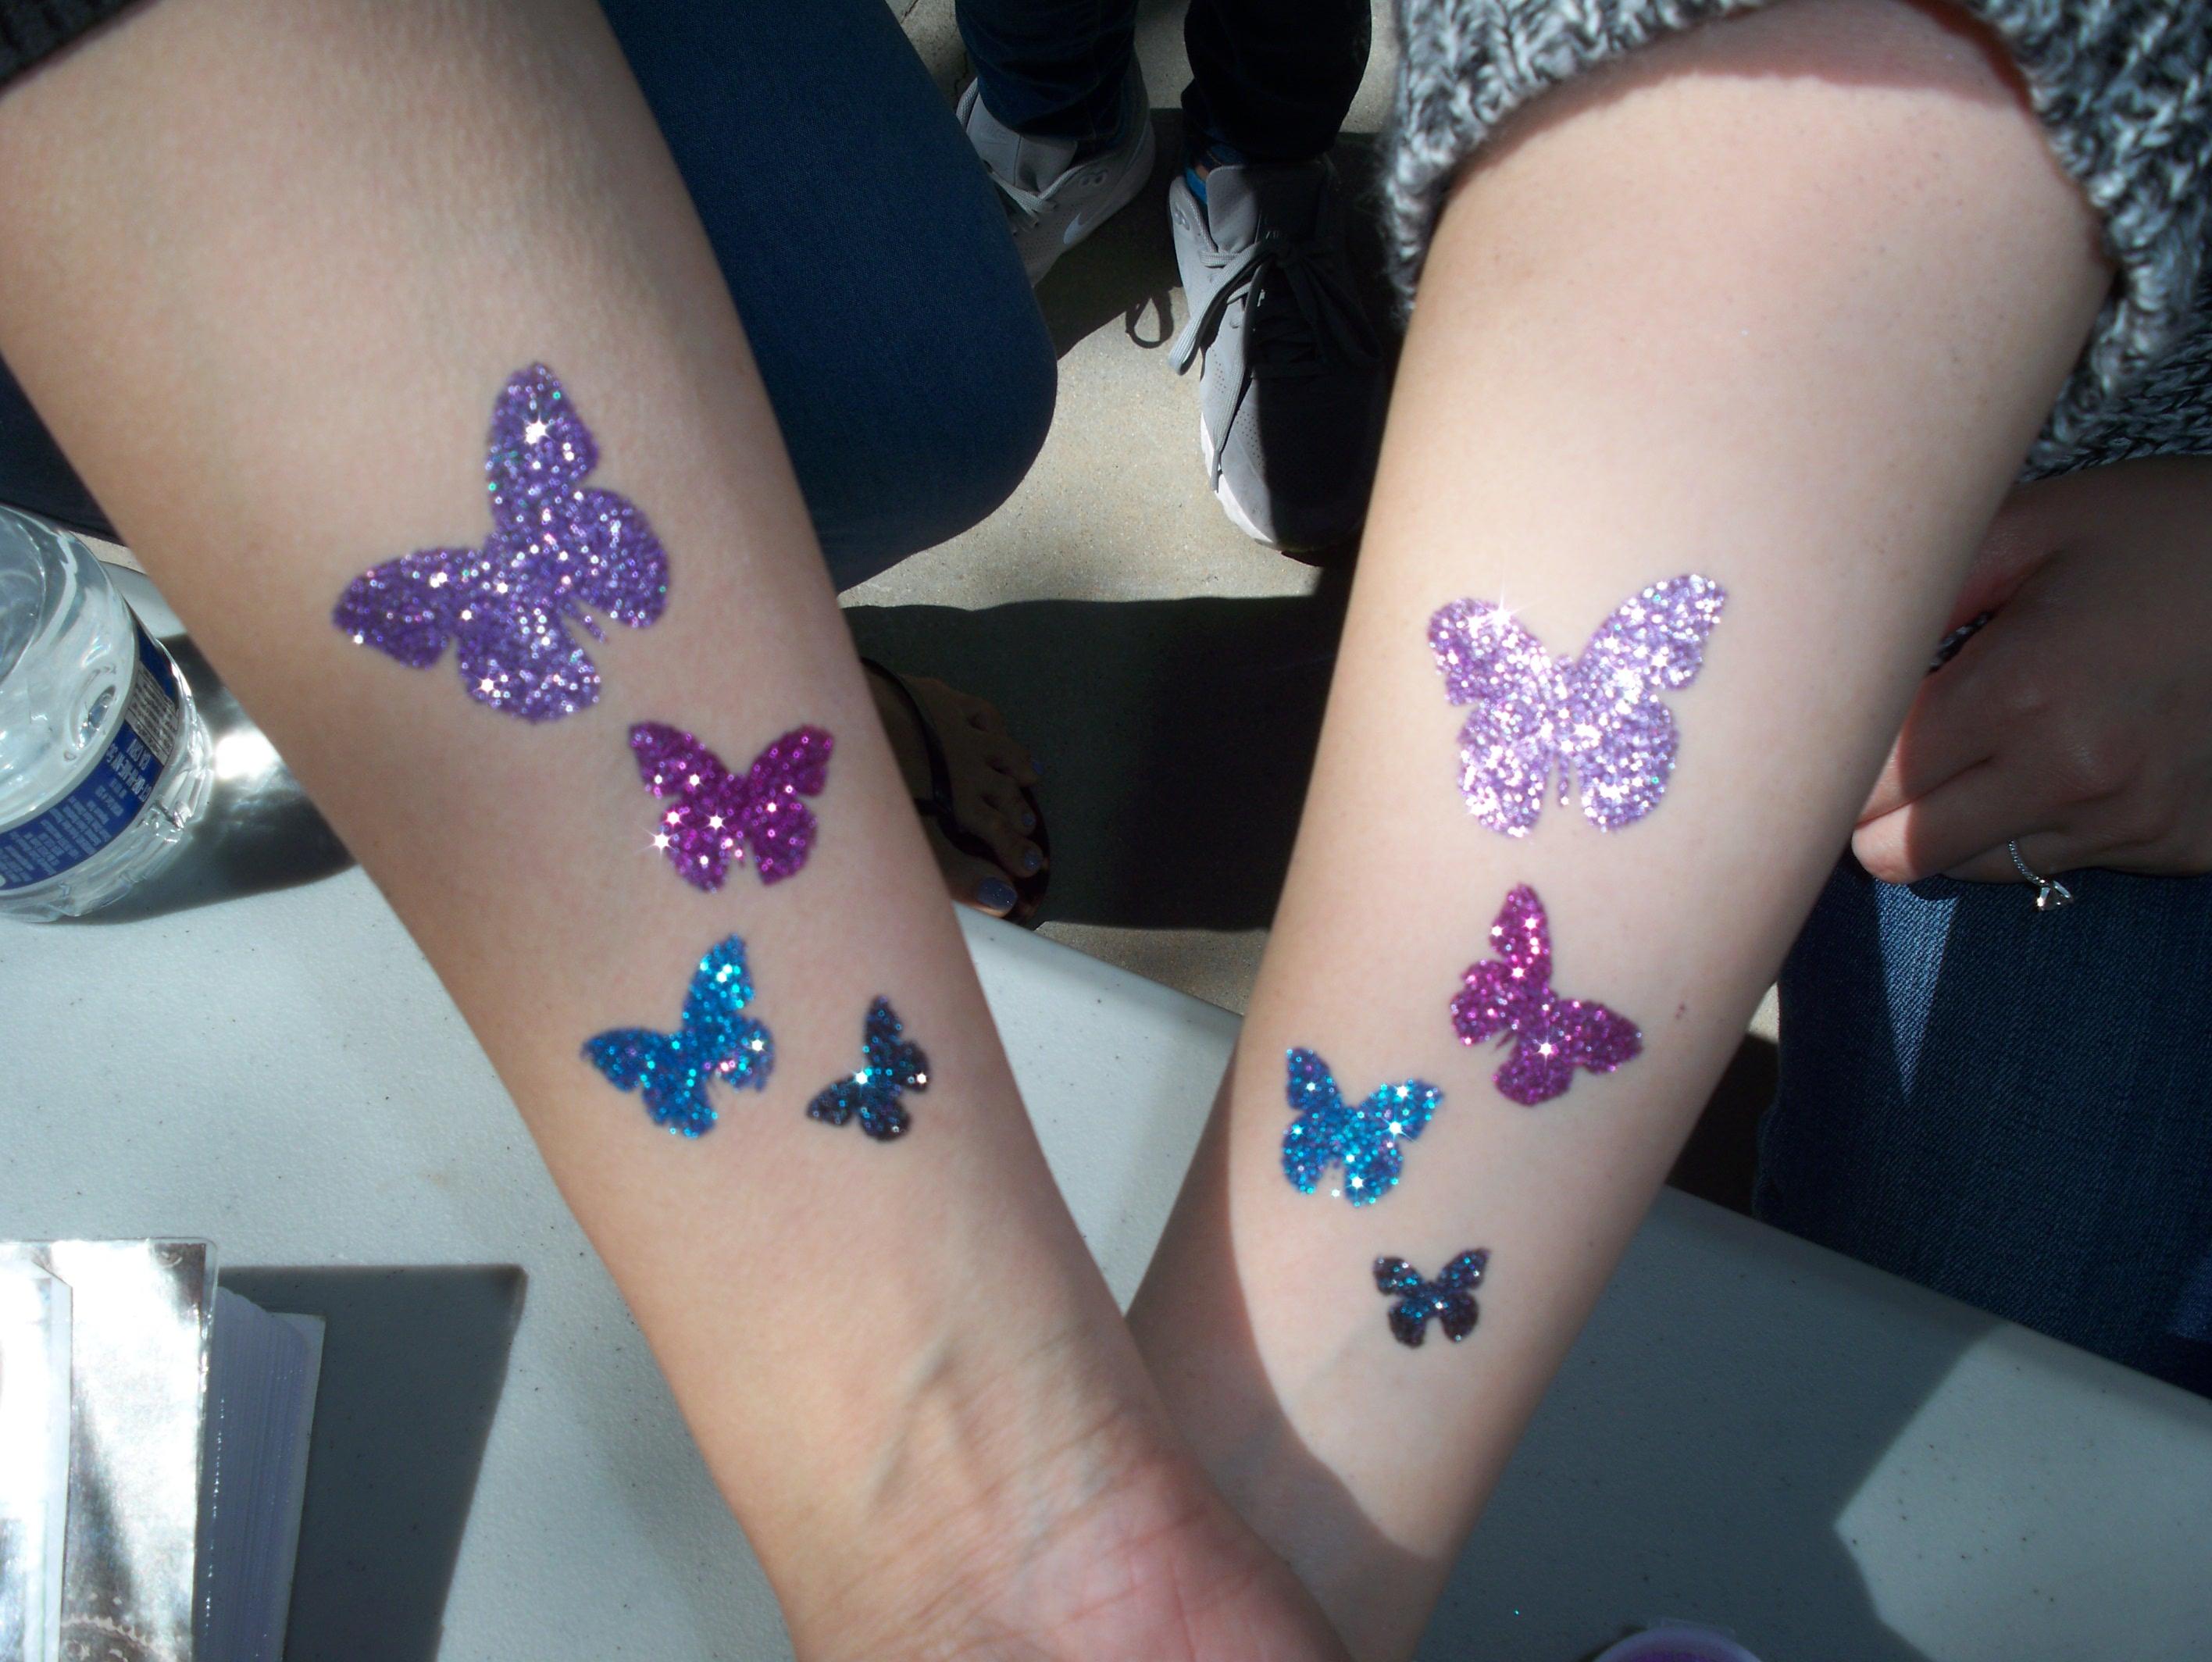 BFFs who love butterflies.